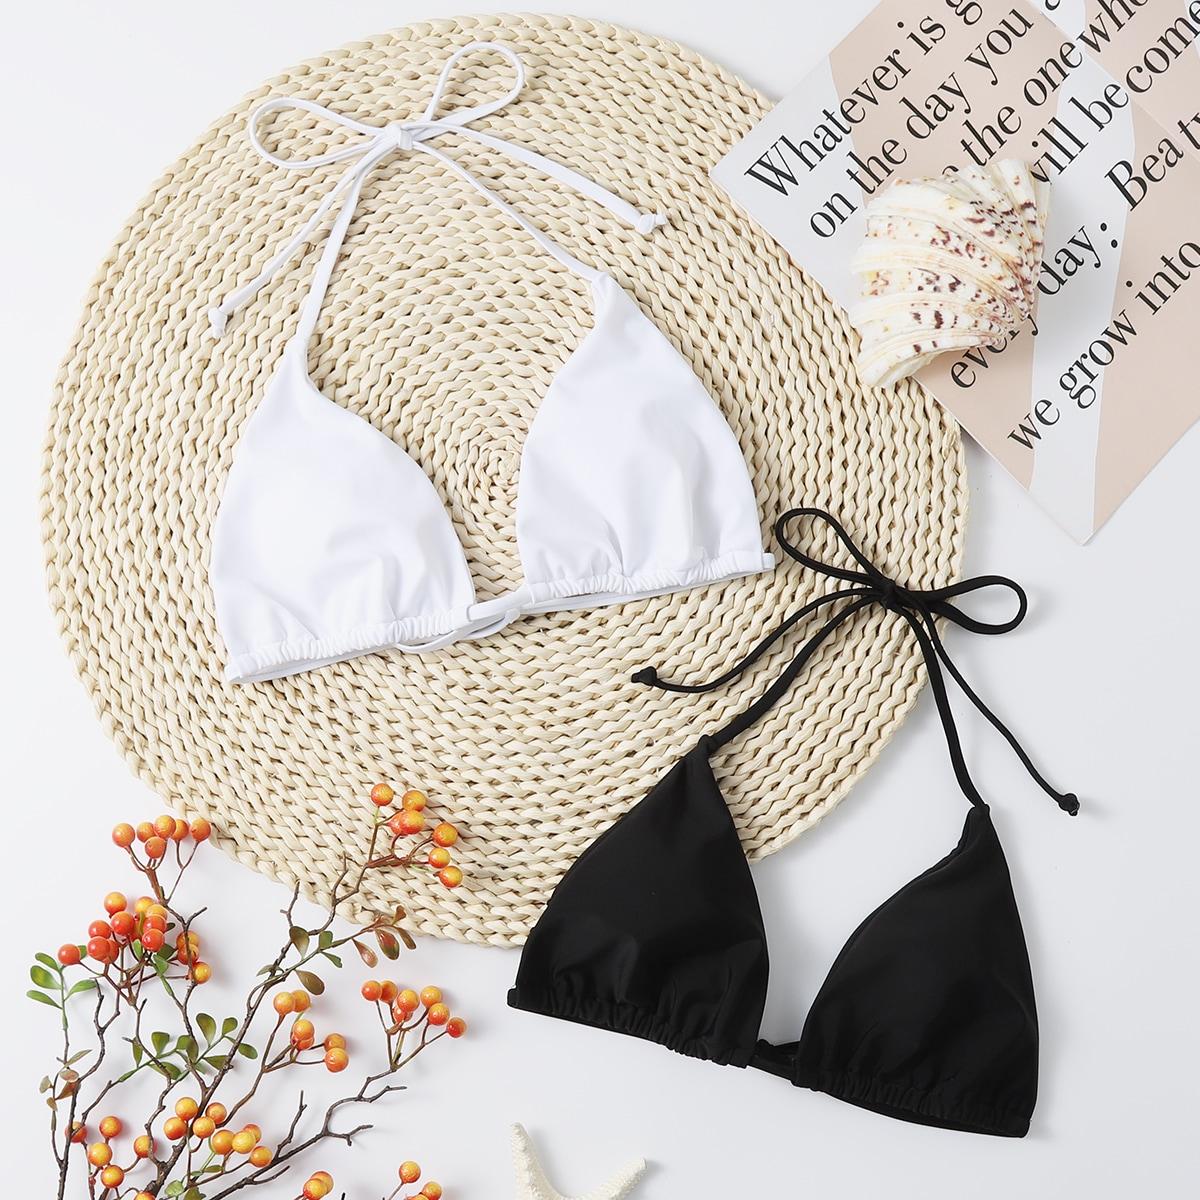 2pack Triangle Bikini Top